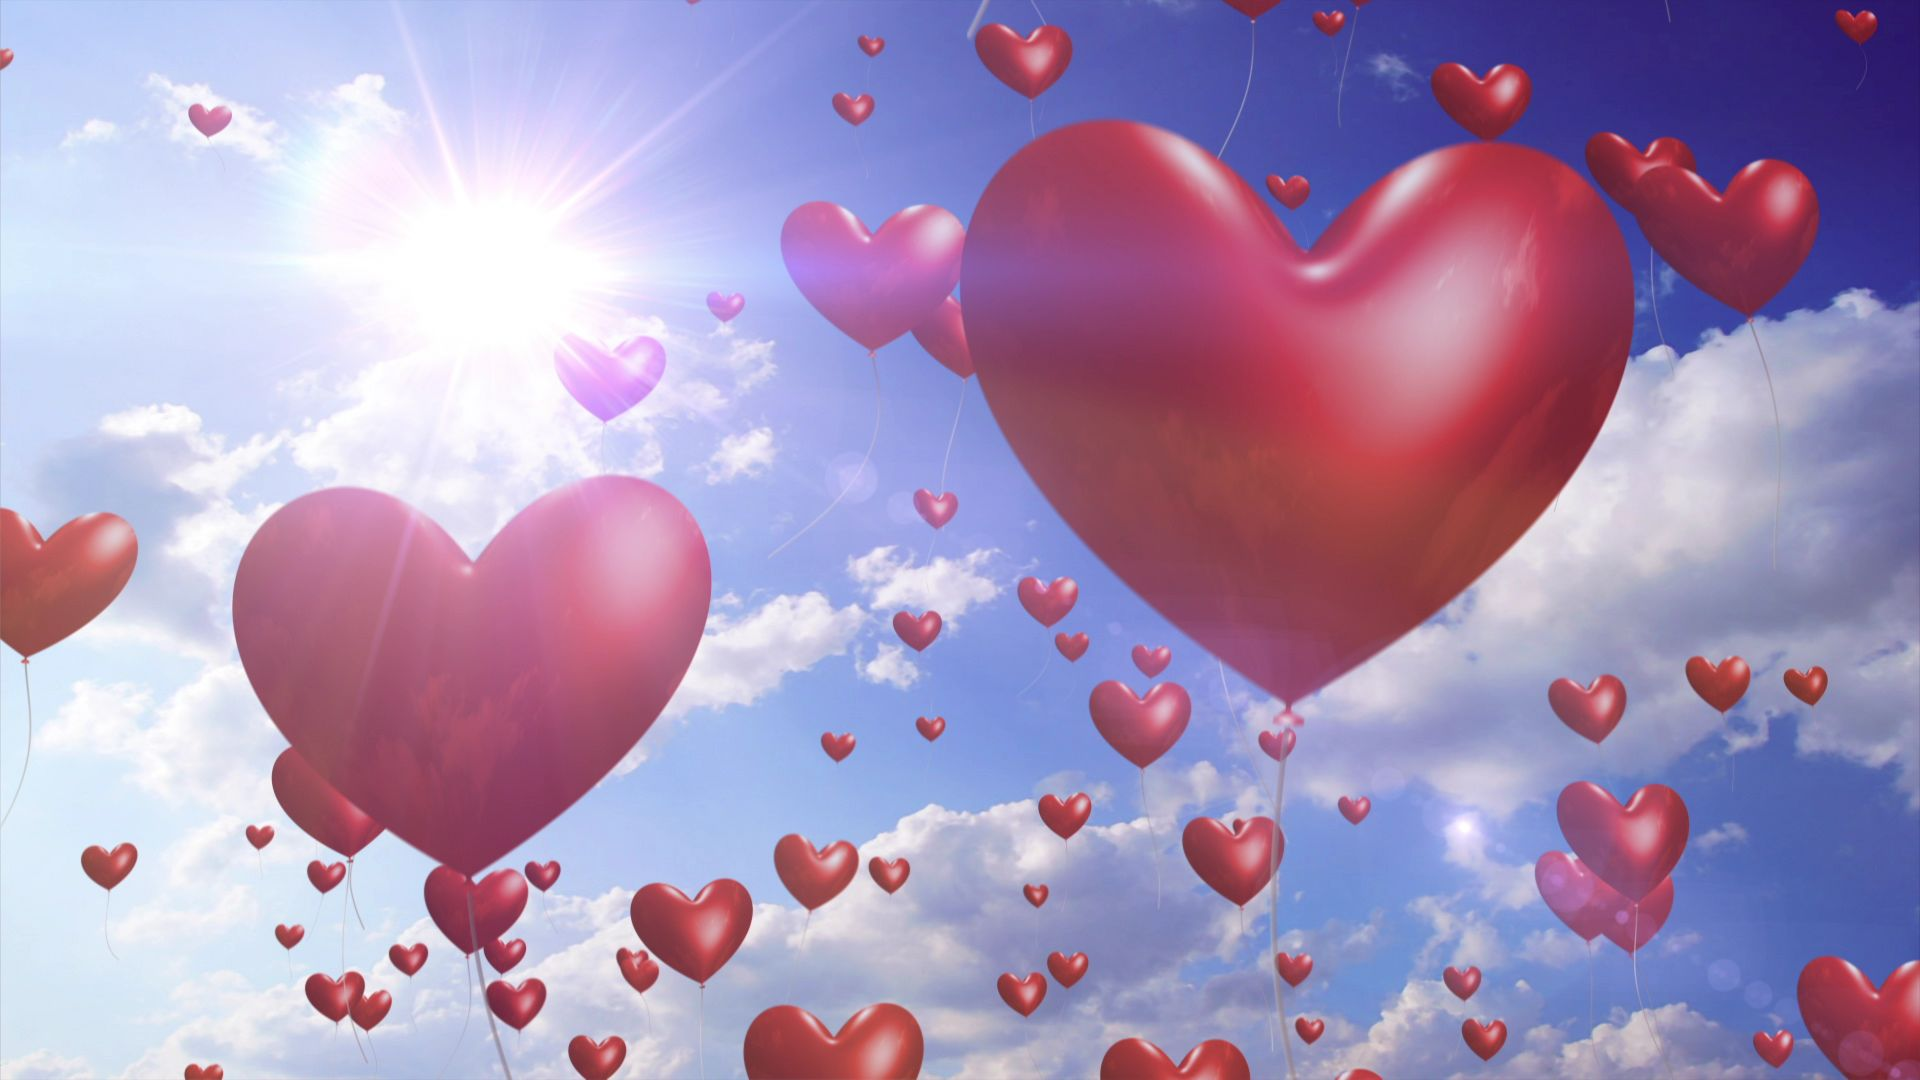 heart, heart, heart, heart, heart (too right to say